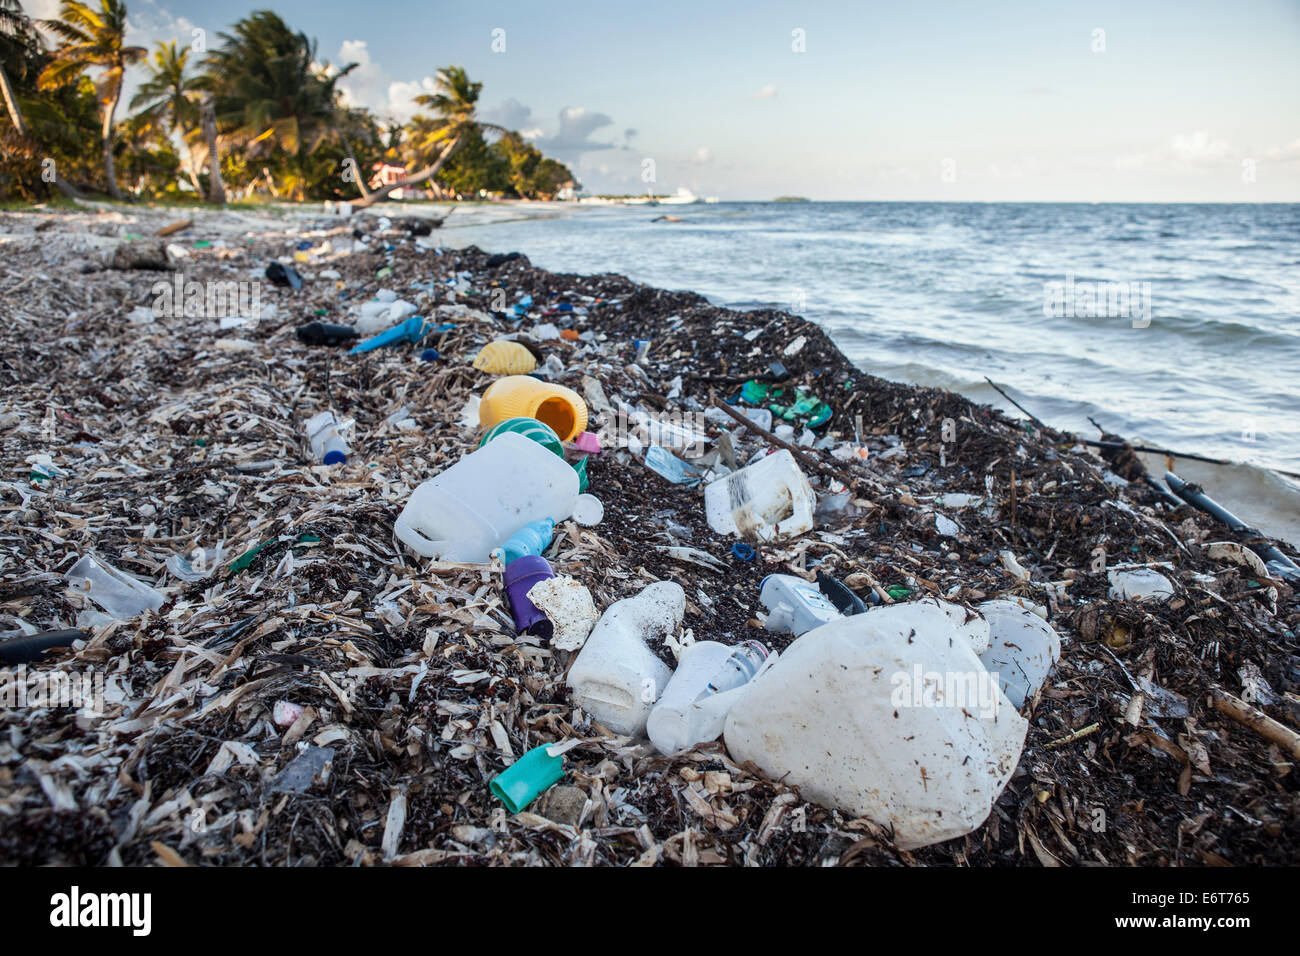 Plastic Waste washed up at shore, Turneffe Atoll, Caribbean, Belize - Stock Image